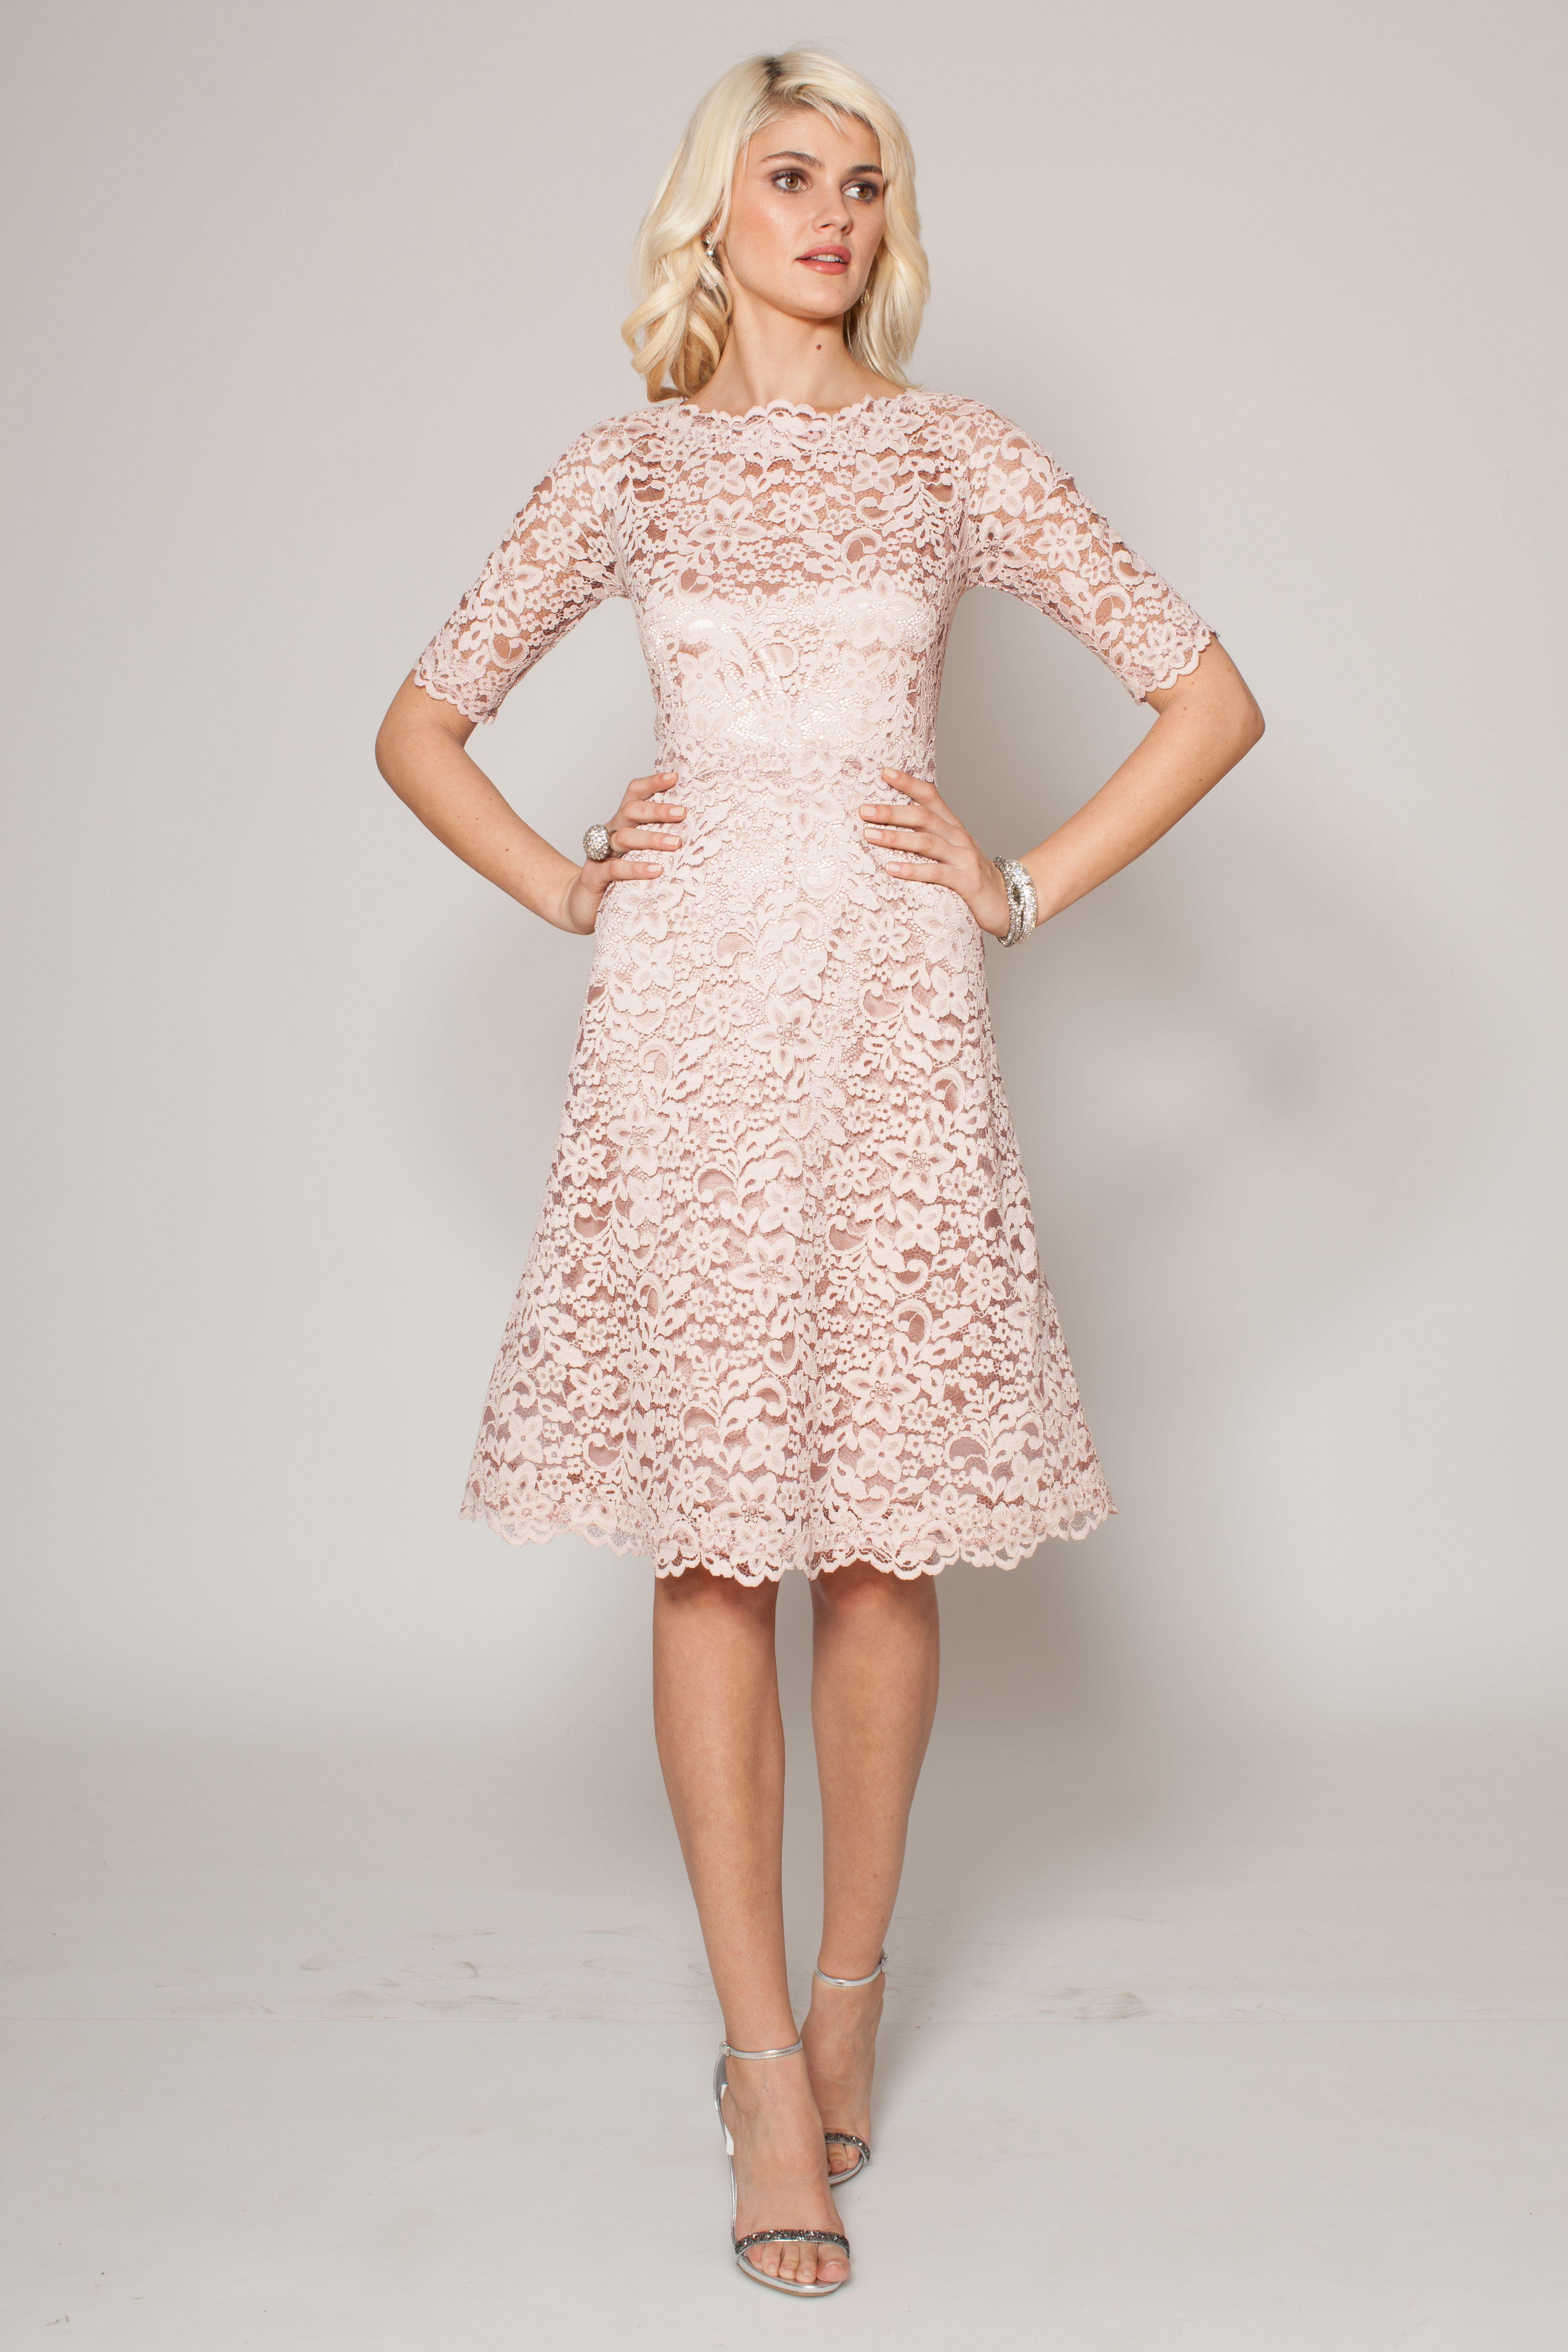 Blush Lace Cocktail Dress